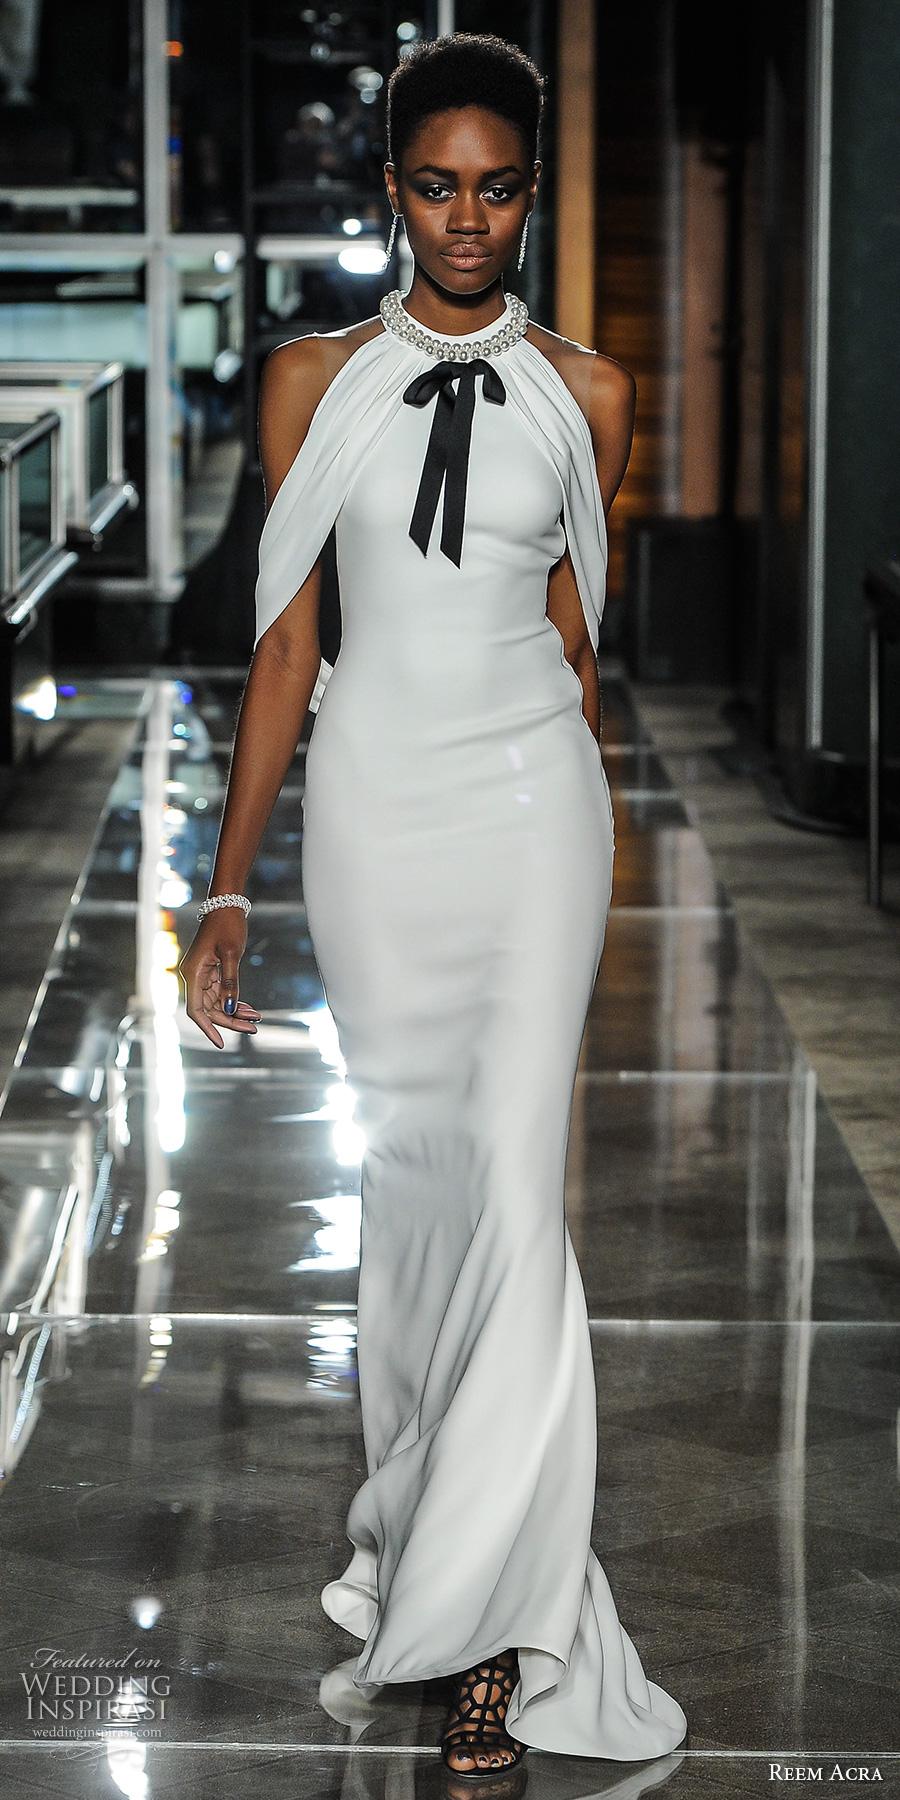 reem acra spring 2018 bridal sleeveless halter neck simple clean elegant chic sheath wedding dress open back sweep train (05) mv